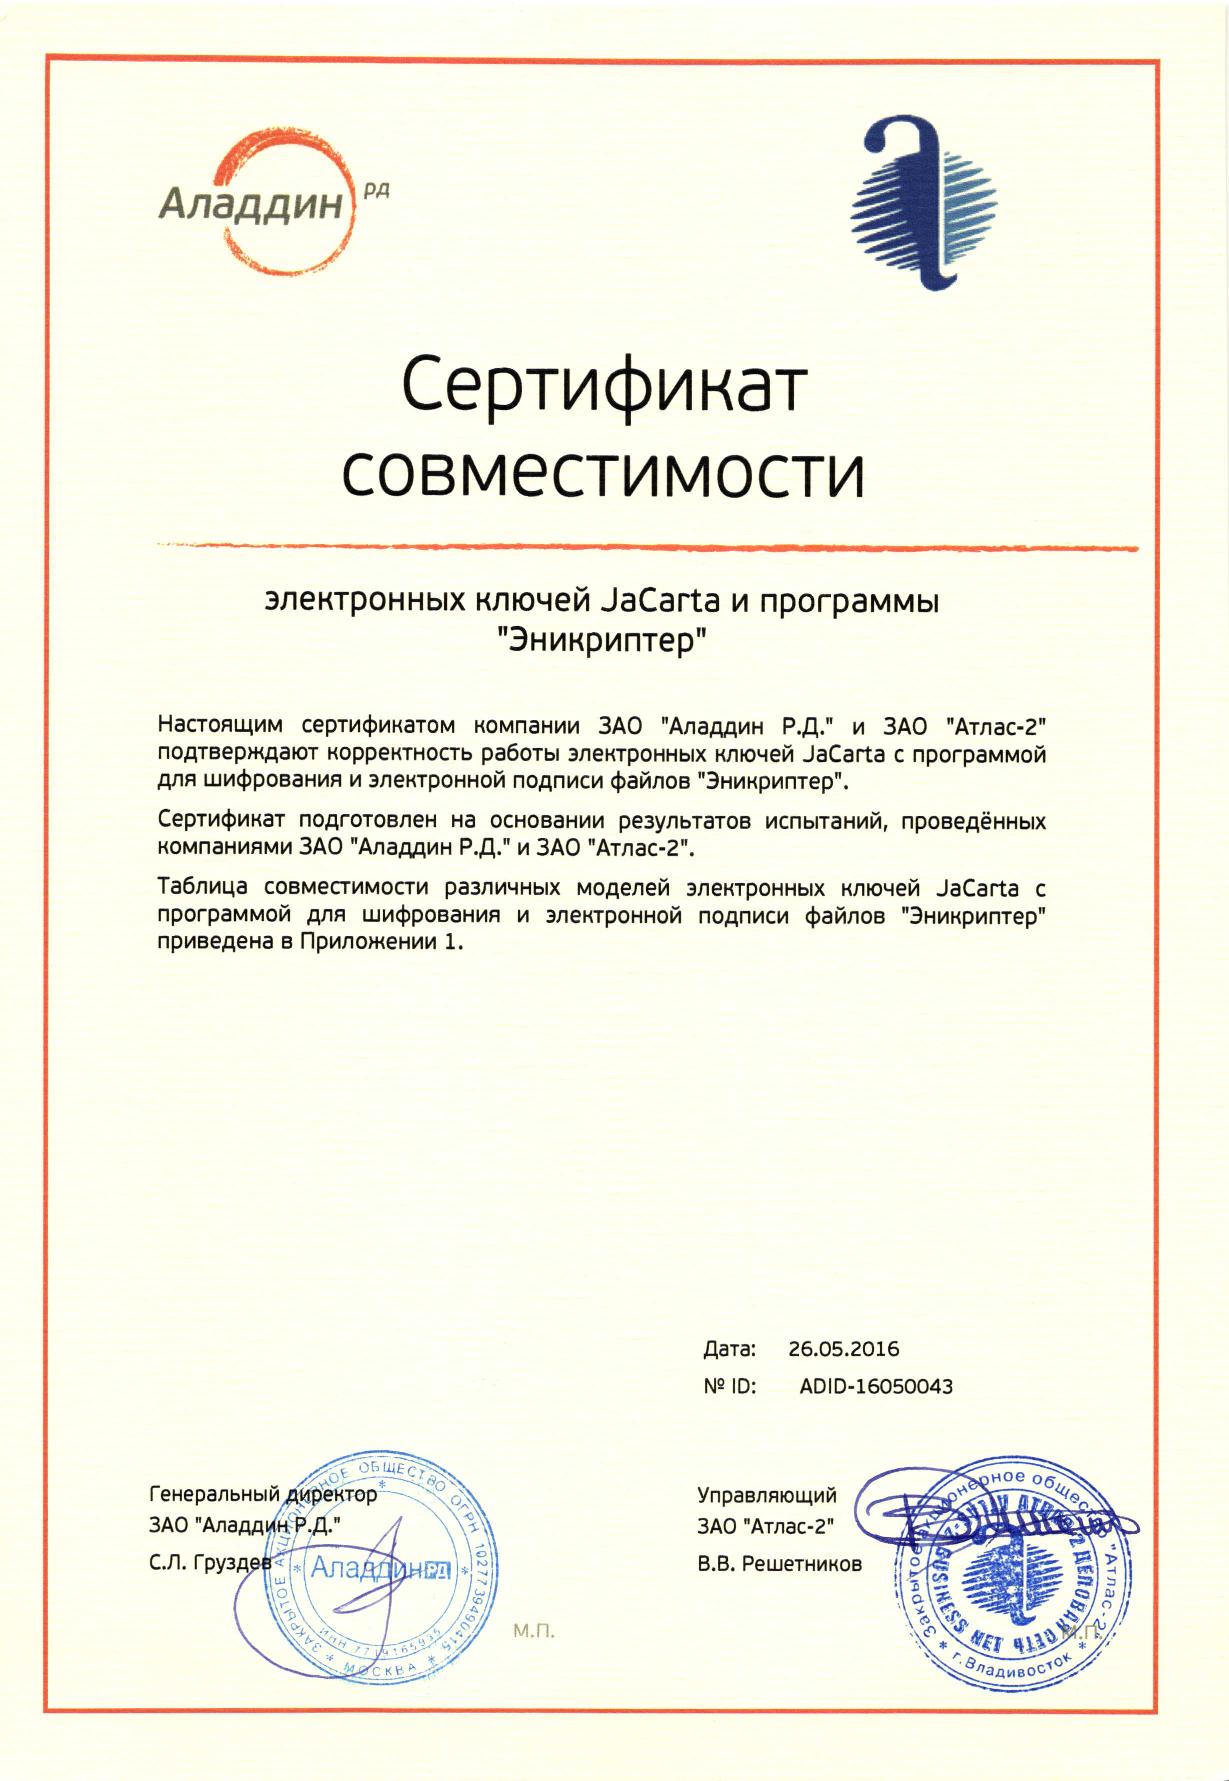 Сертификат совместимости Джакарта